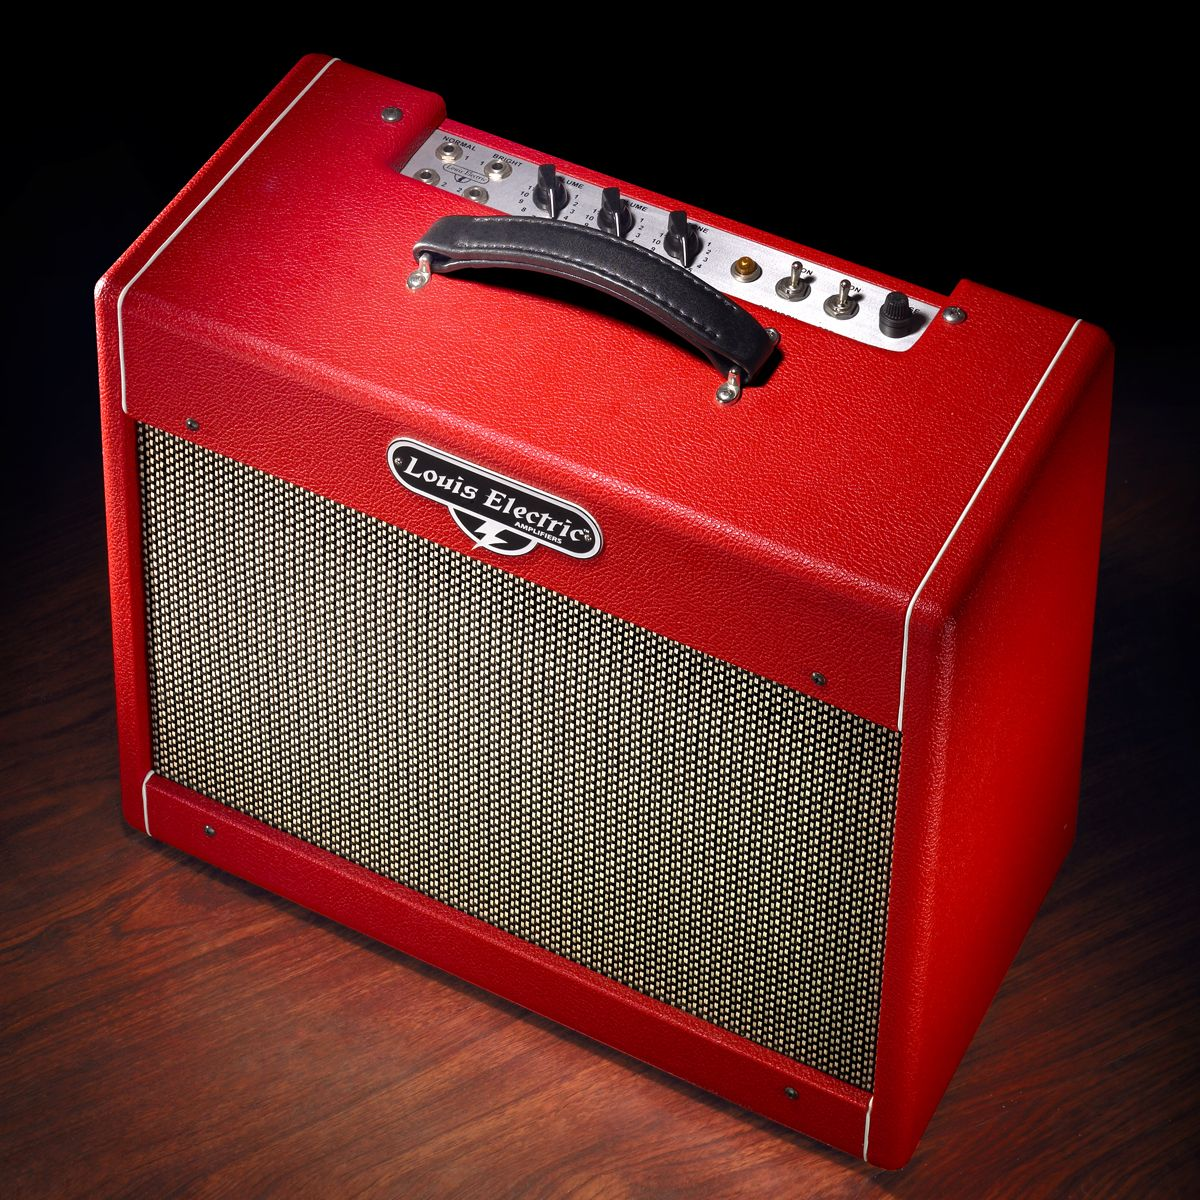 louis electric hd12 guitar amplifier louis electric guitar amps in 2019 guitar chords. Black Bedroom Furniture Sets. Home Design Ideas